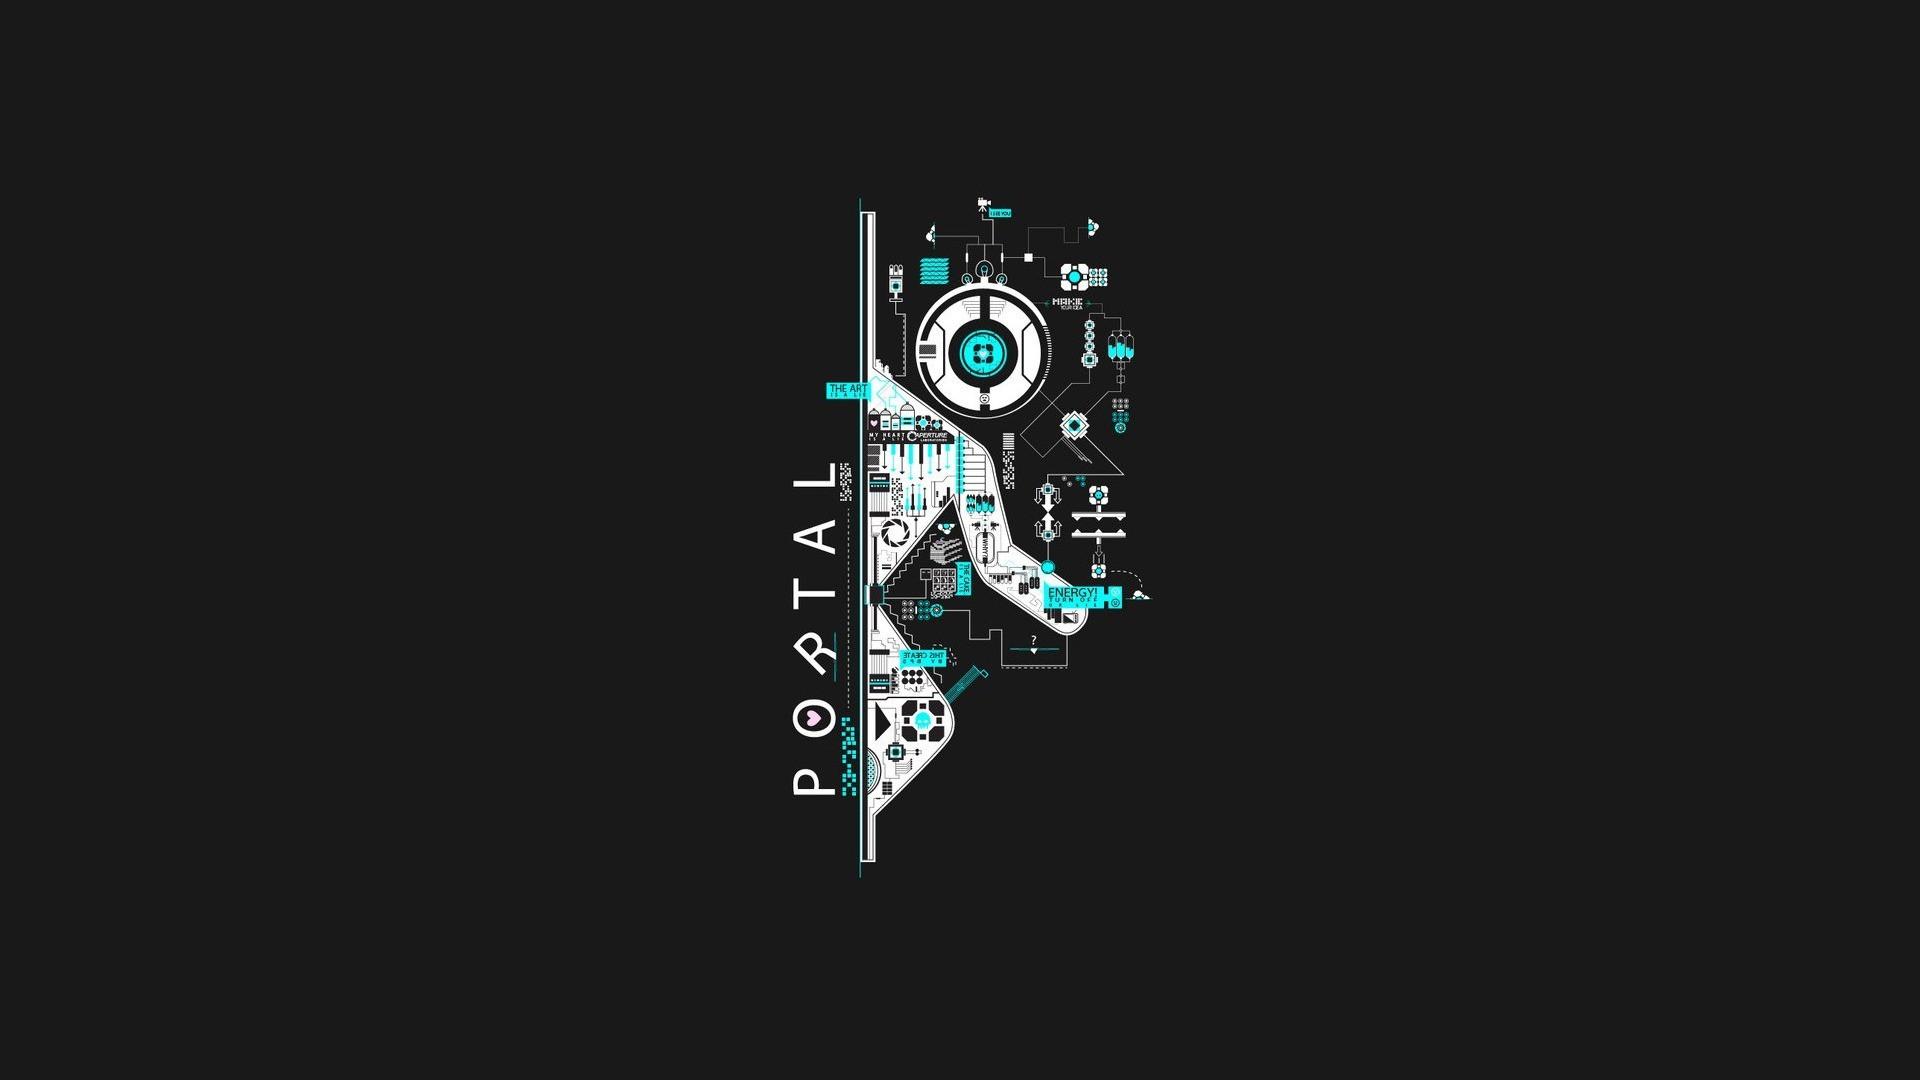 Wallpaper Illustration Video Games Artwork Text Logo Portal 2 Game Circuits Glados Brand Companion Cube Valve